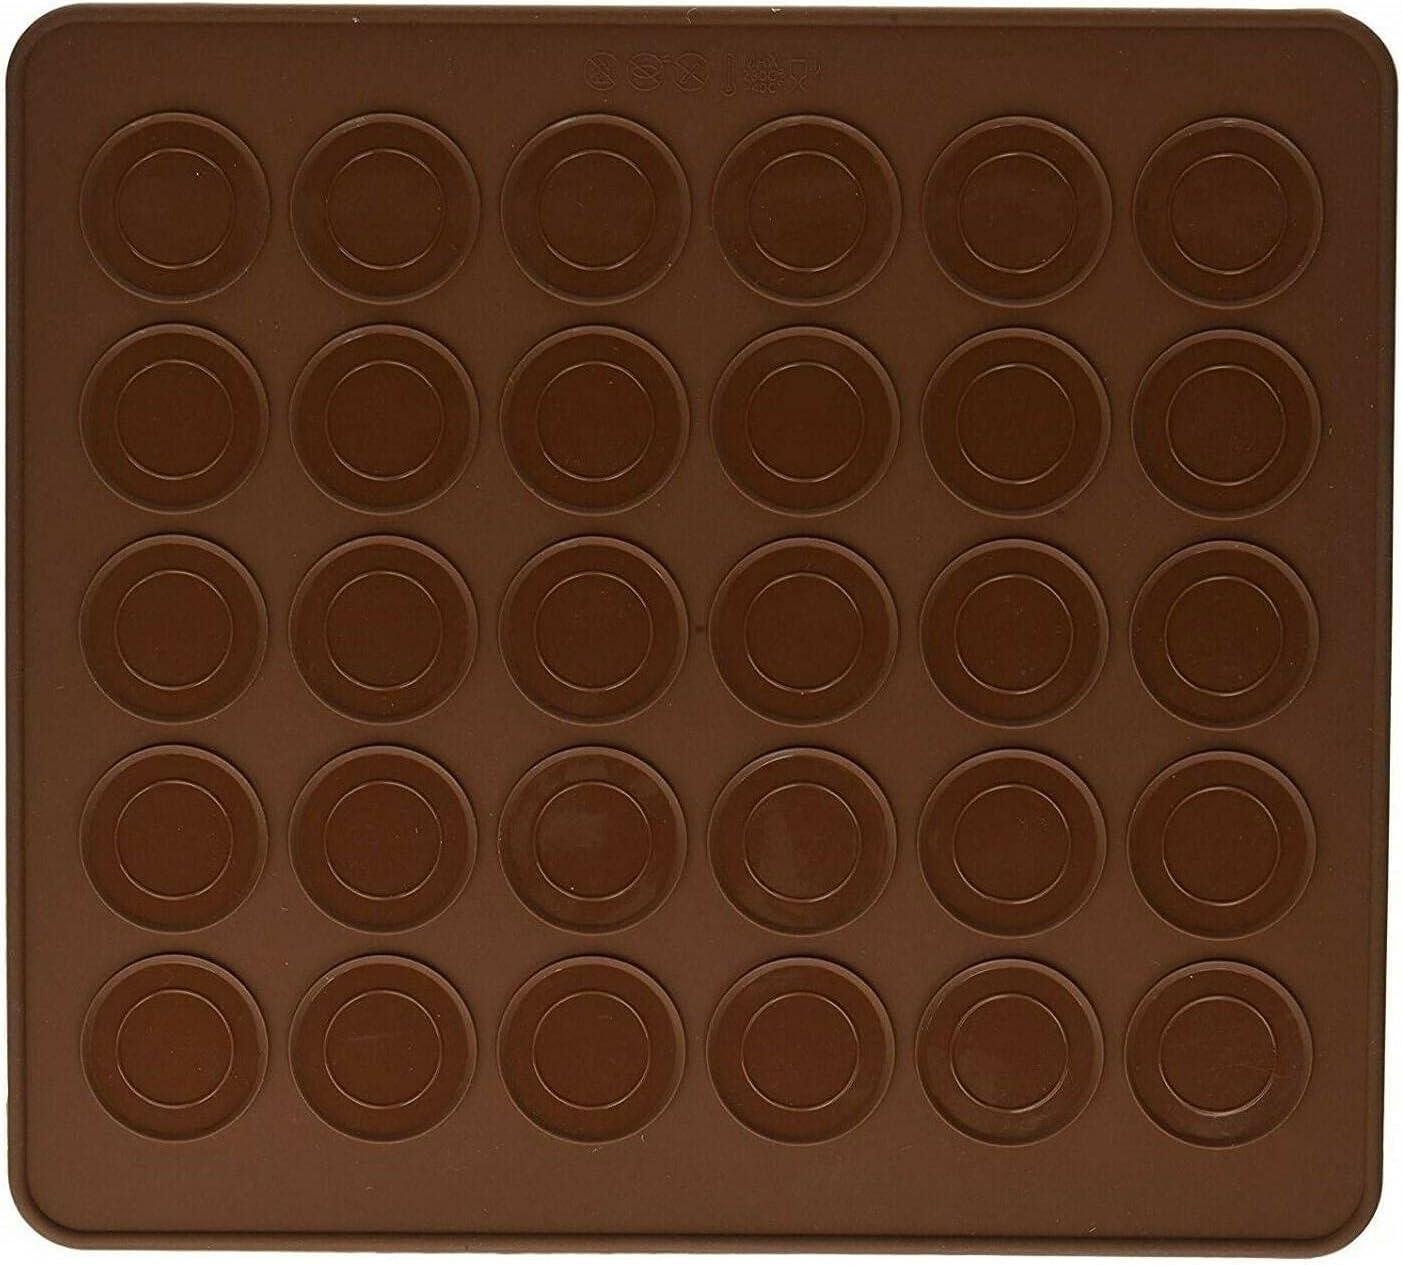 2 Pack Silicon Baking Mat Bak Chocolate San Antonio Mall Sheet Cookie Max 44% OFF Baking-mats